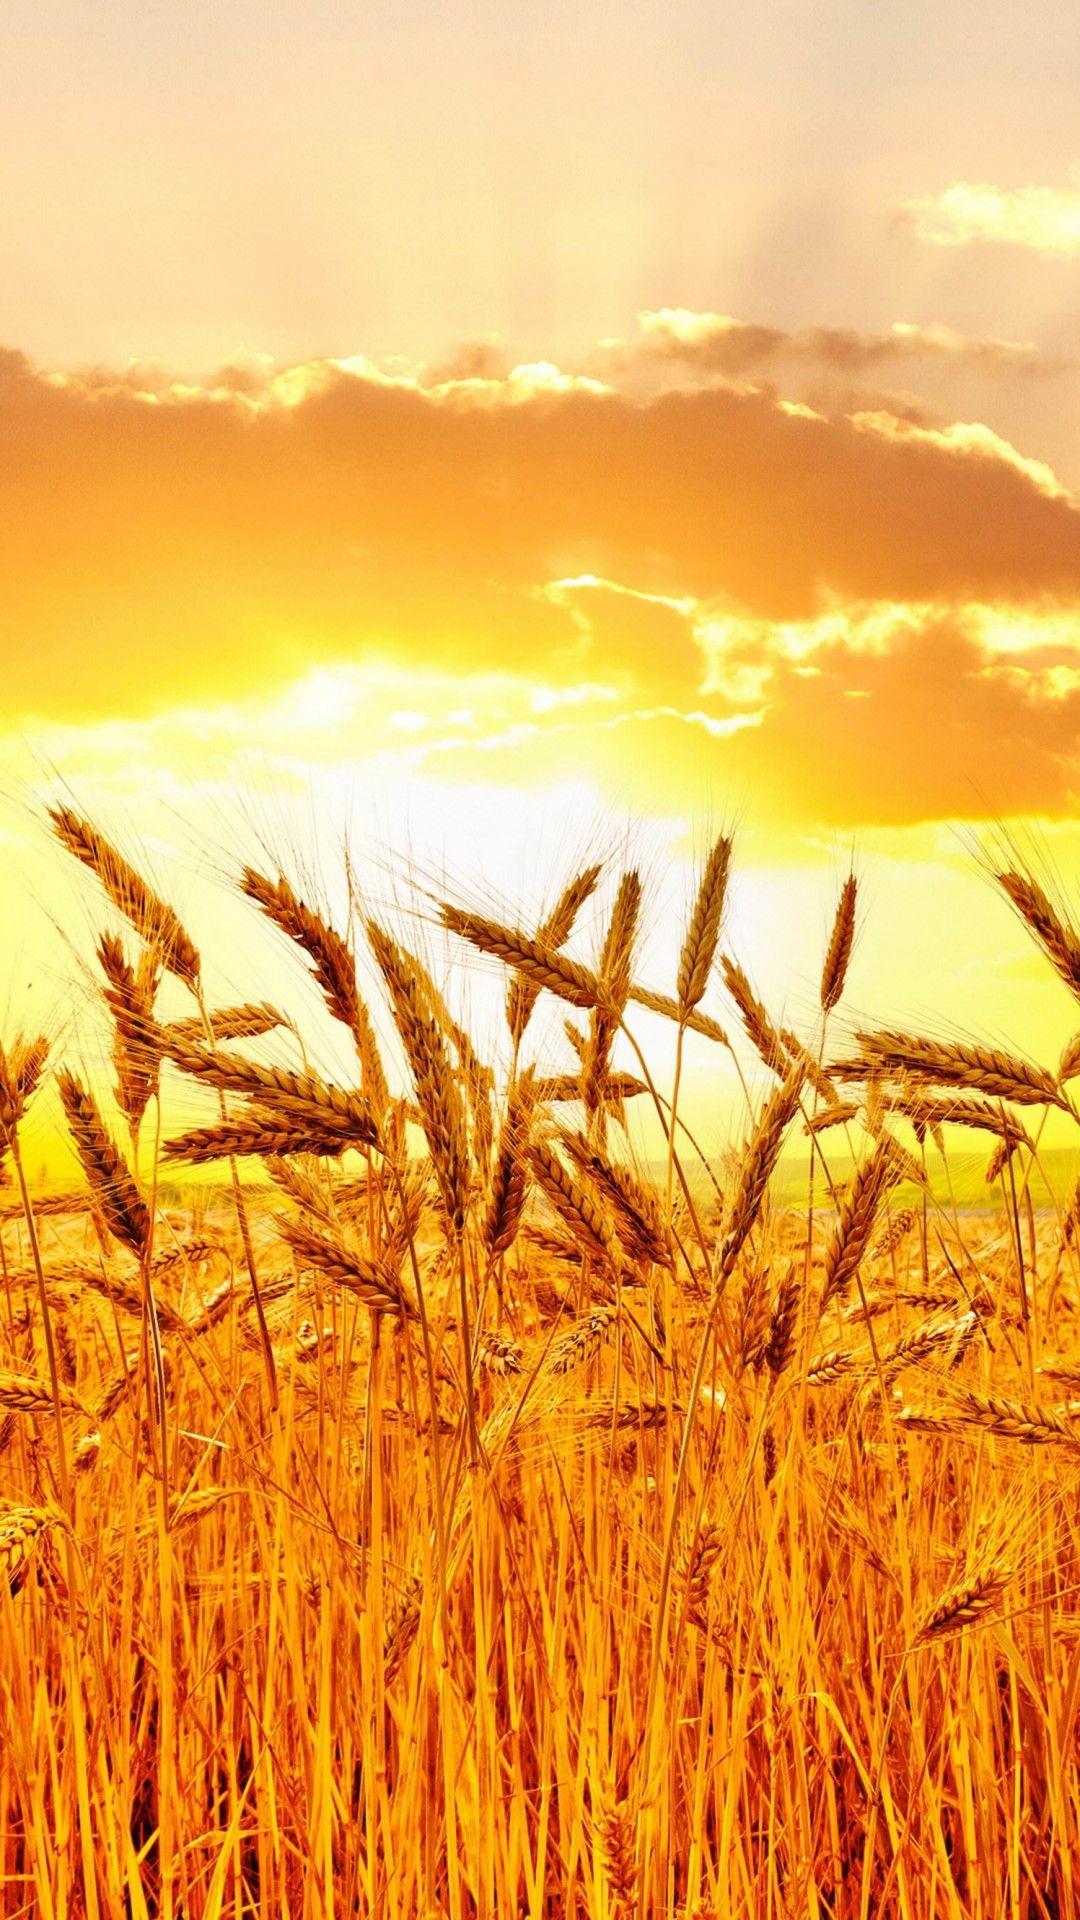 Golden Wheat Field At Sunset Wallpaper for SAMSUNG Galaxy ...